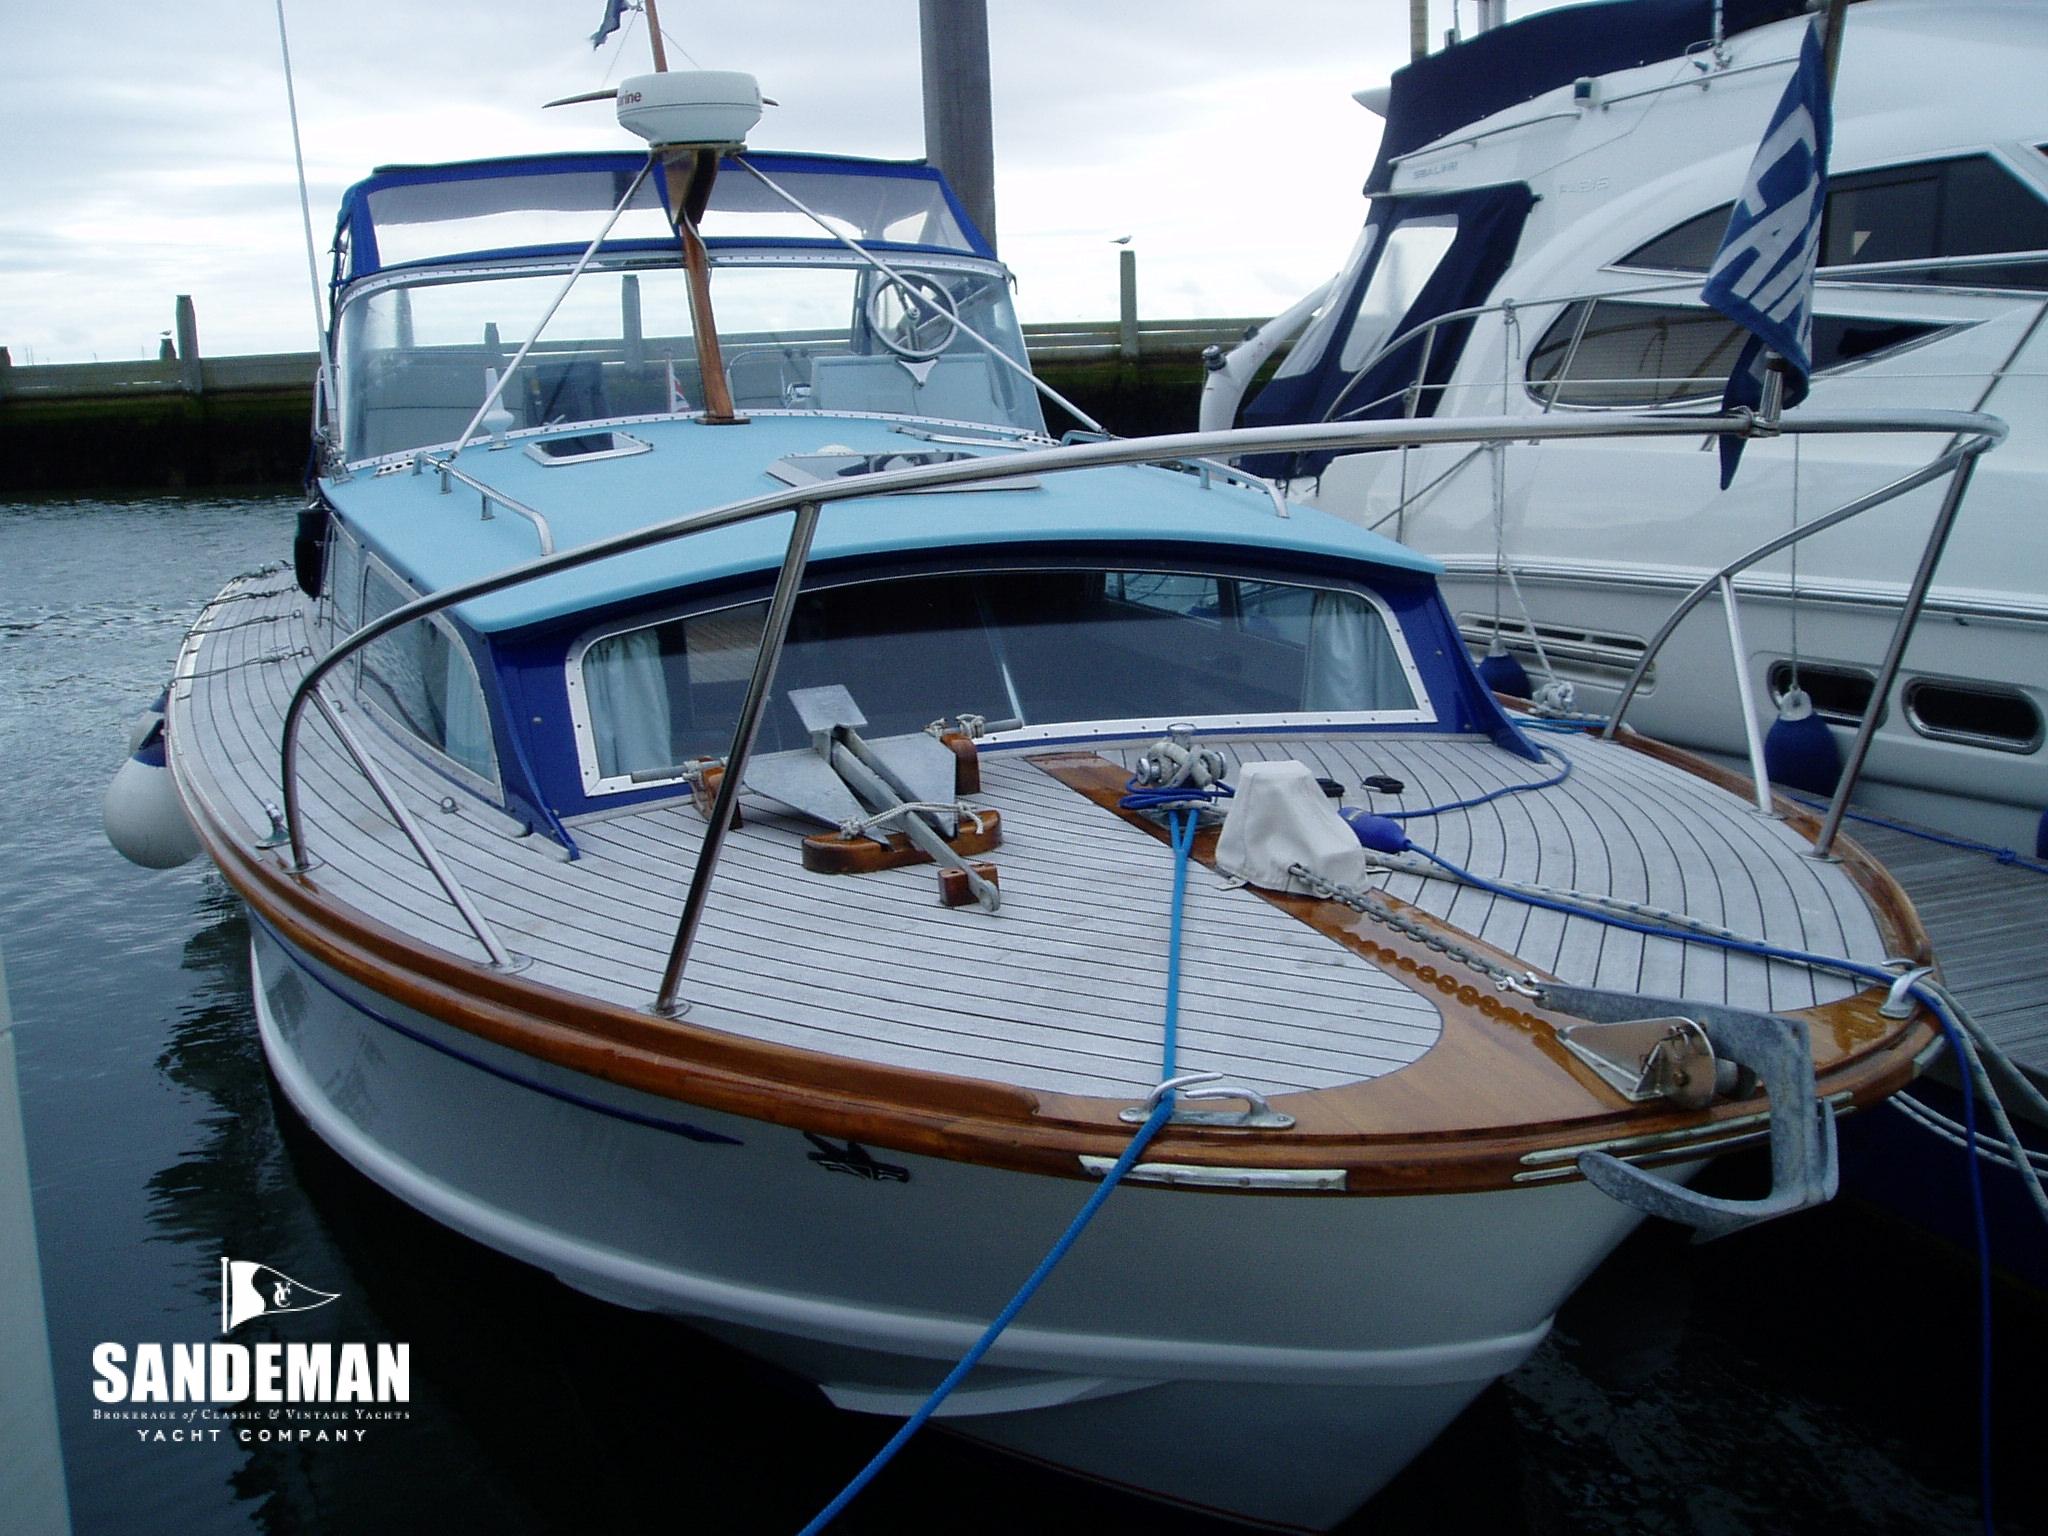 Fairey Swordsman 33 Aft Cabin 1970 Sandeman Yacht Company